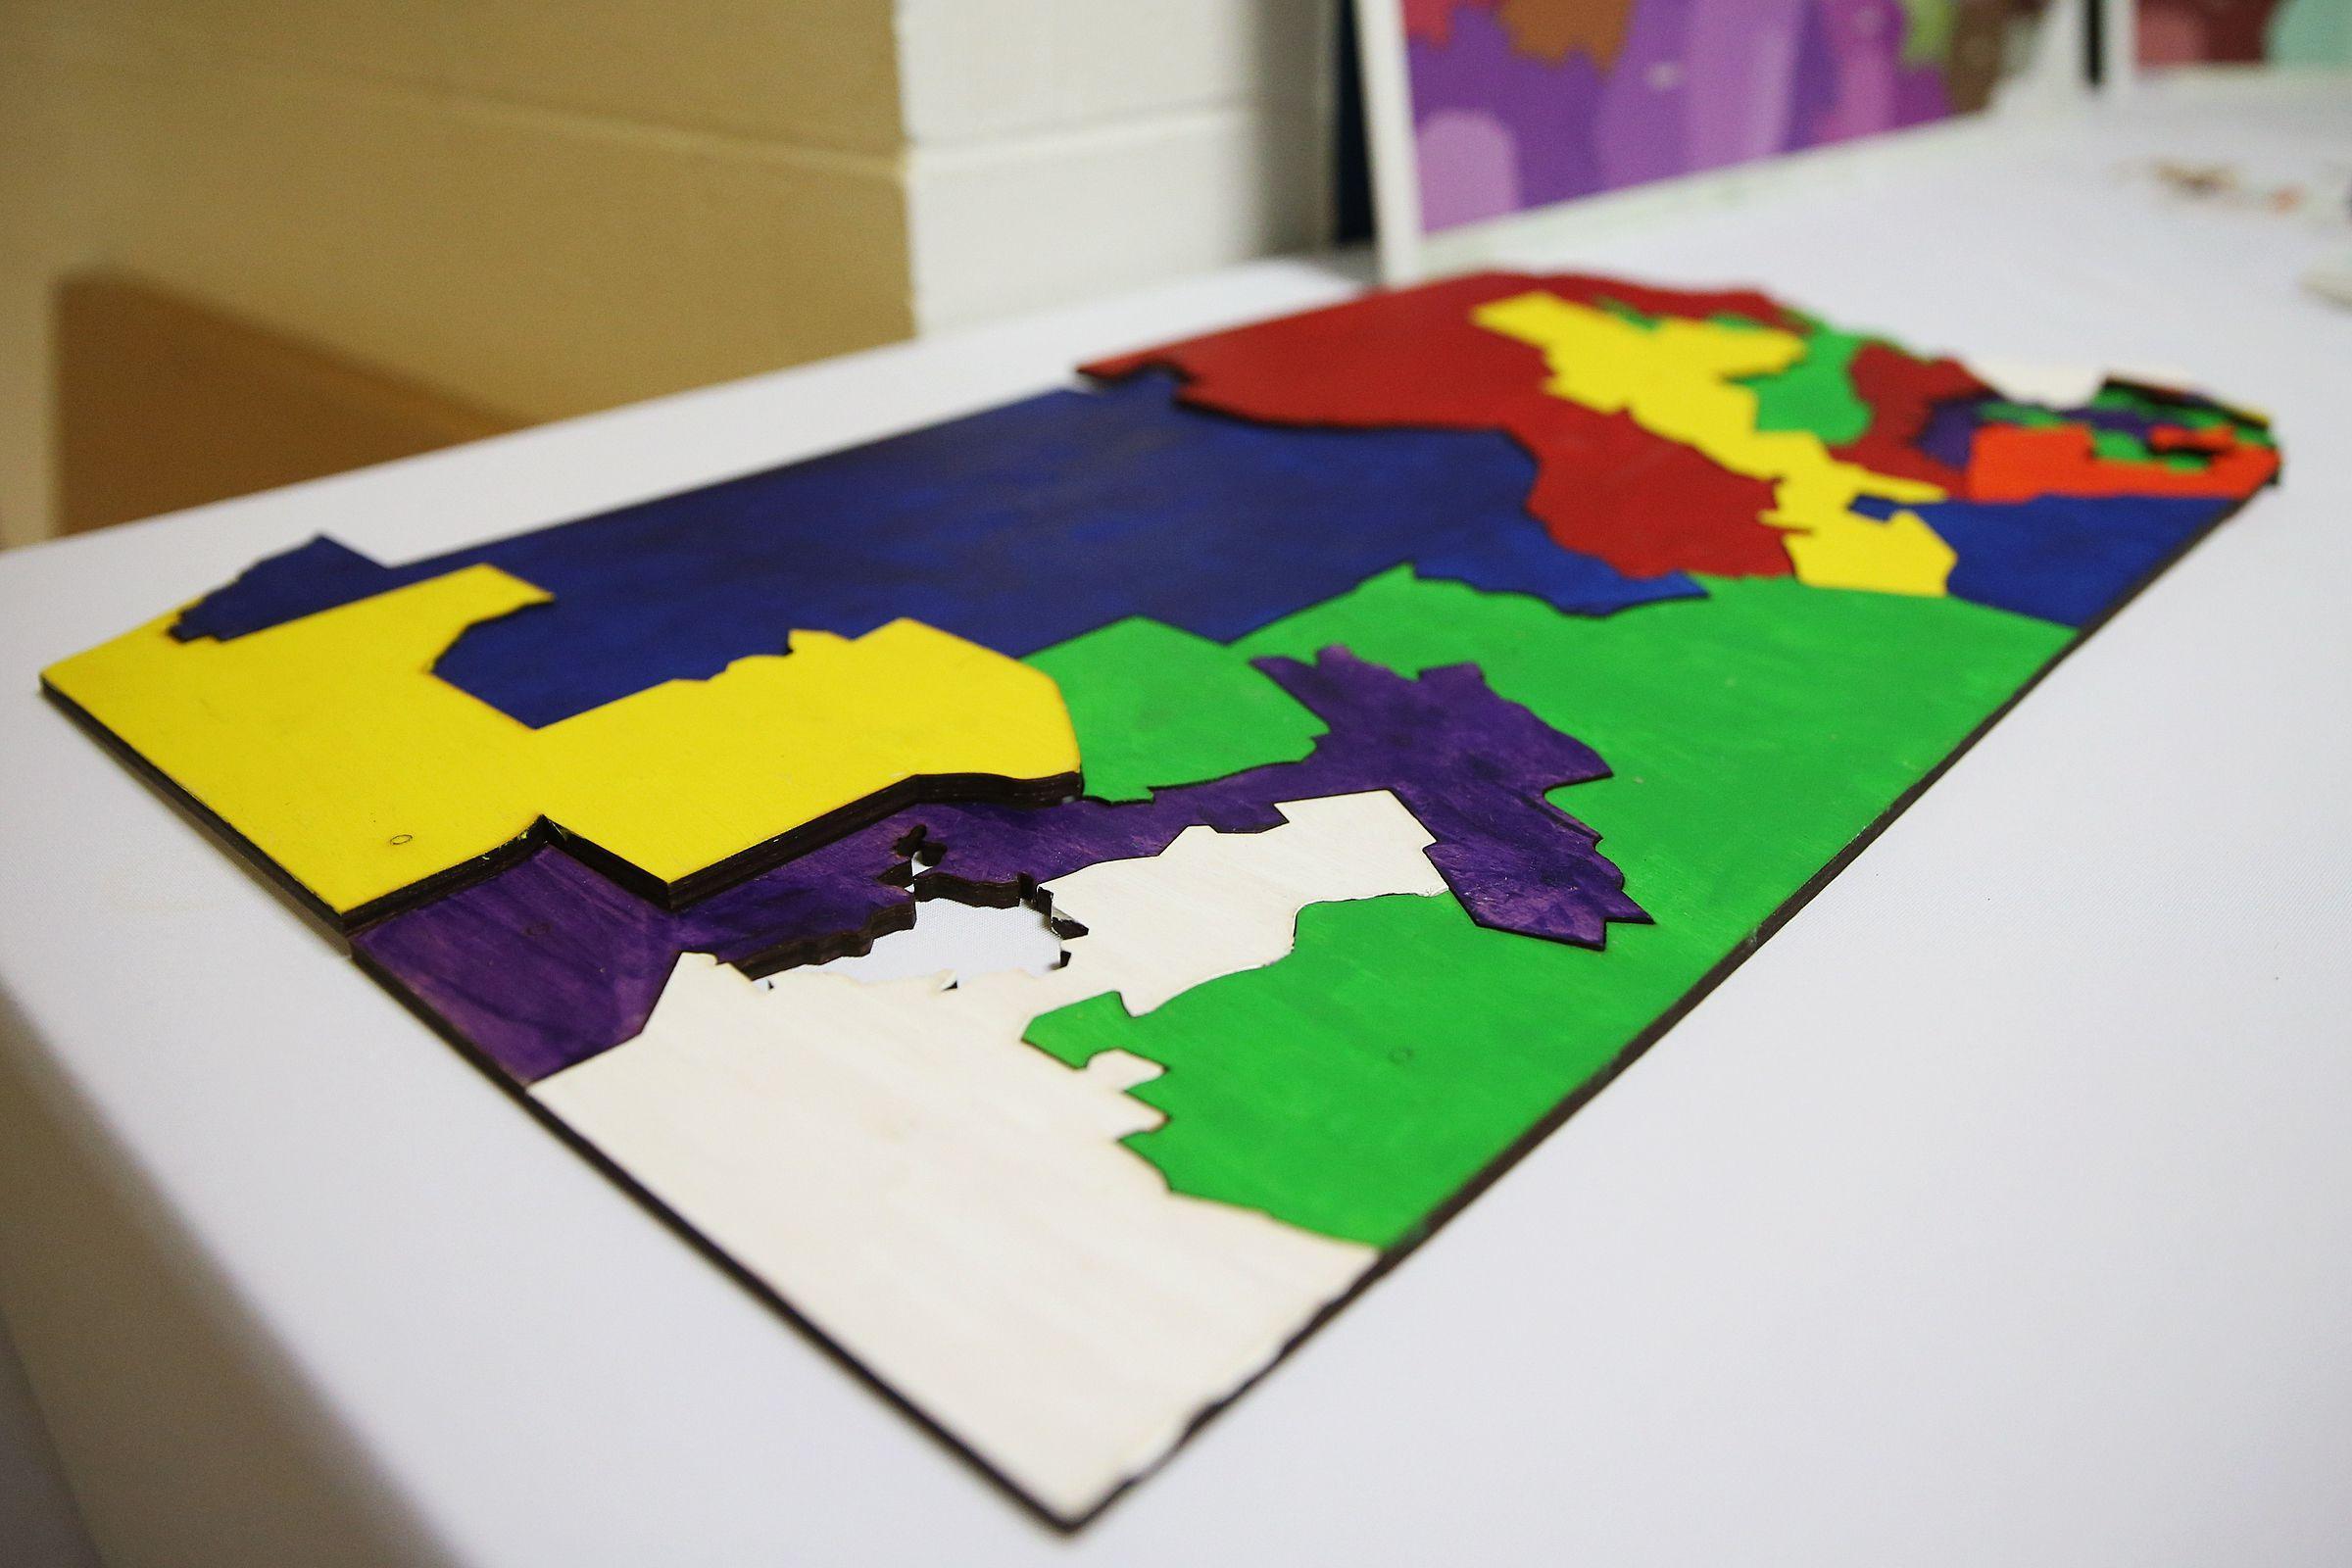 A Pa. congressional map